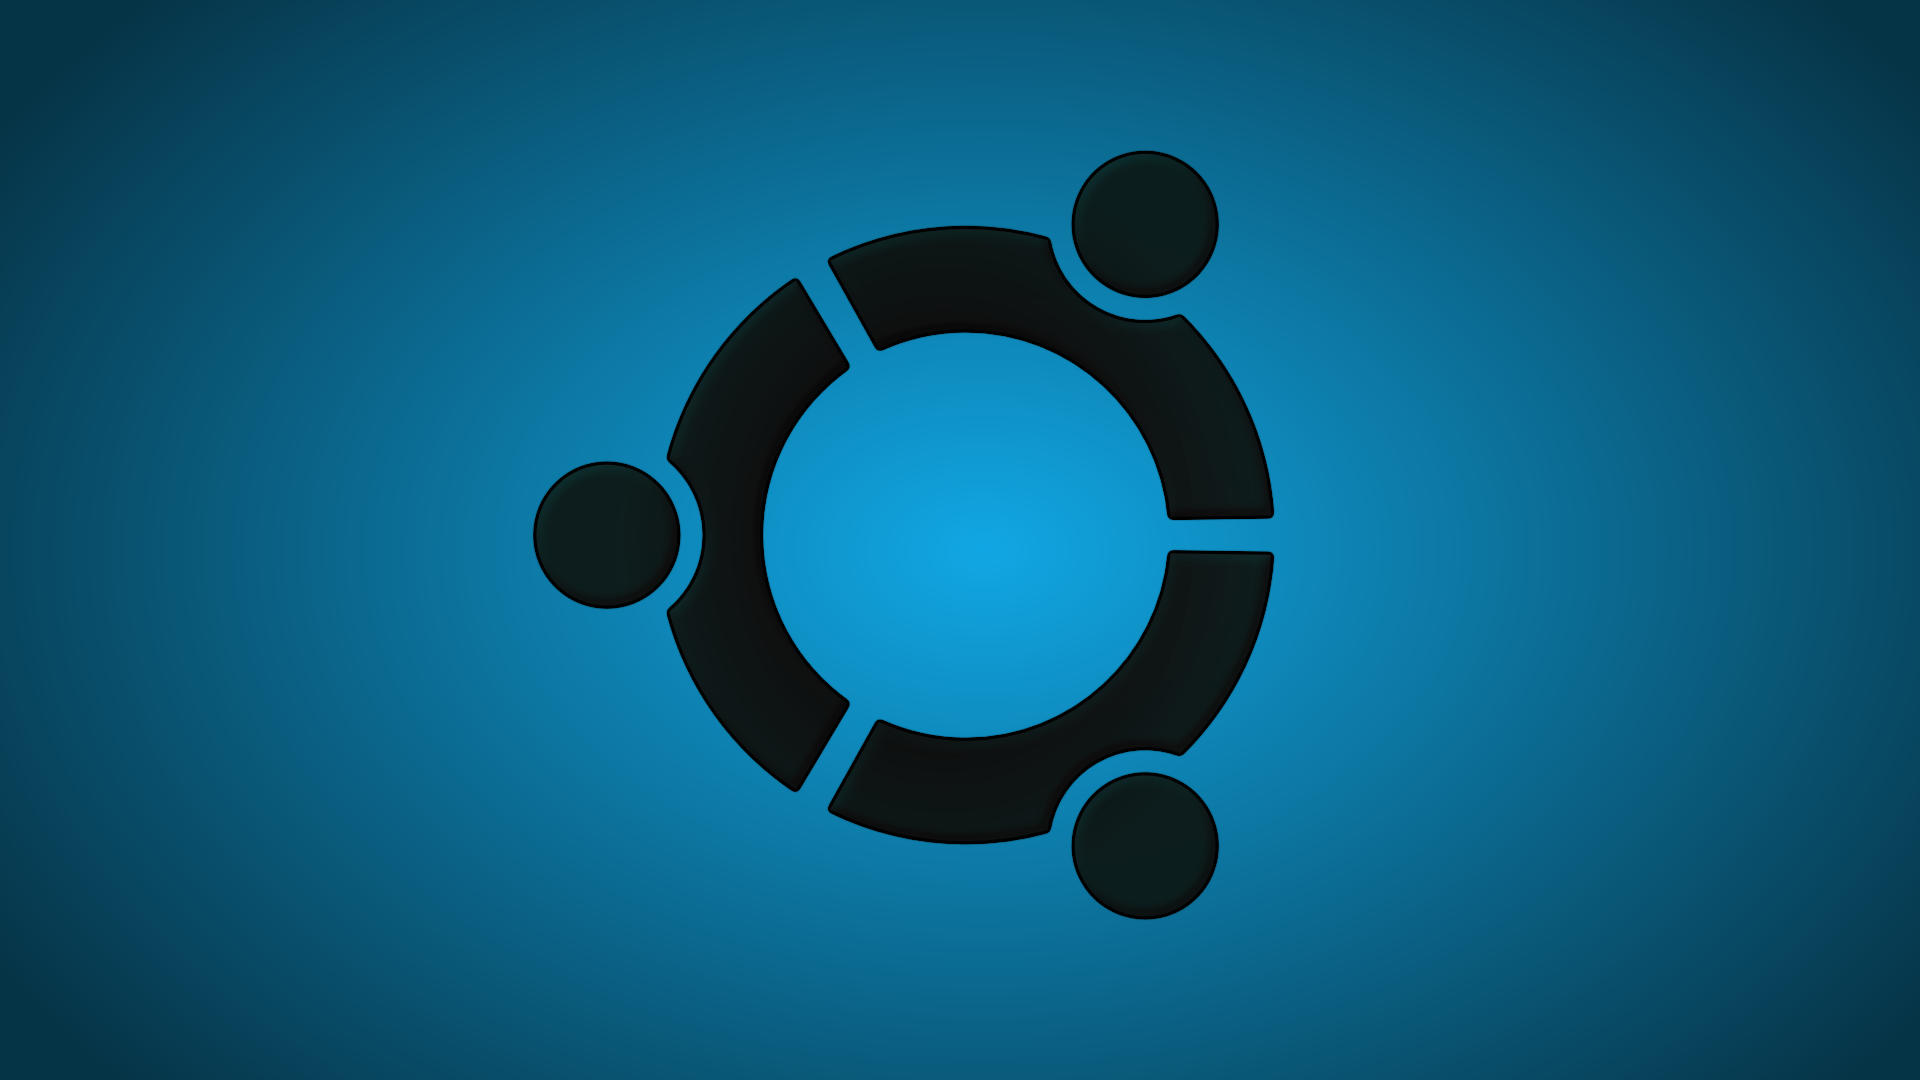 blue ubuntu wallpaper by quidsup customization wallpaper mac pc os 1920x1080